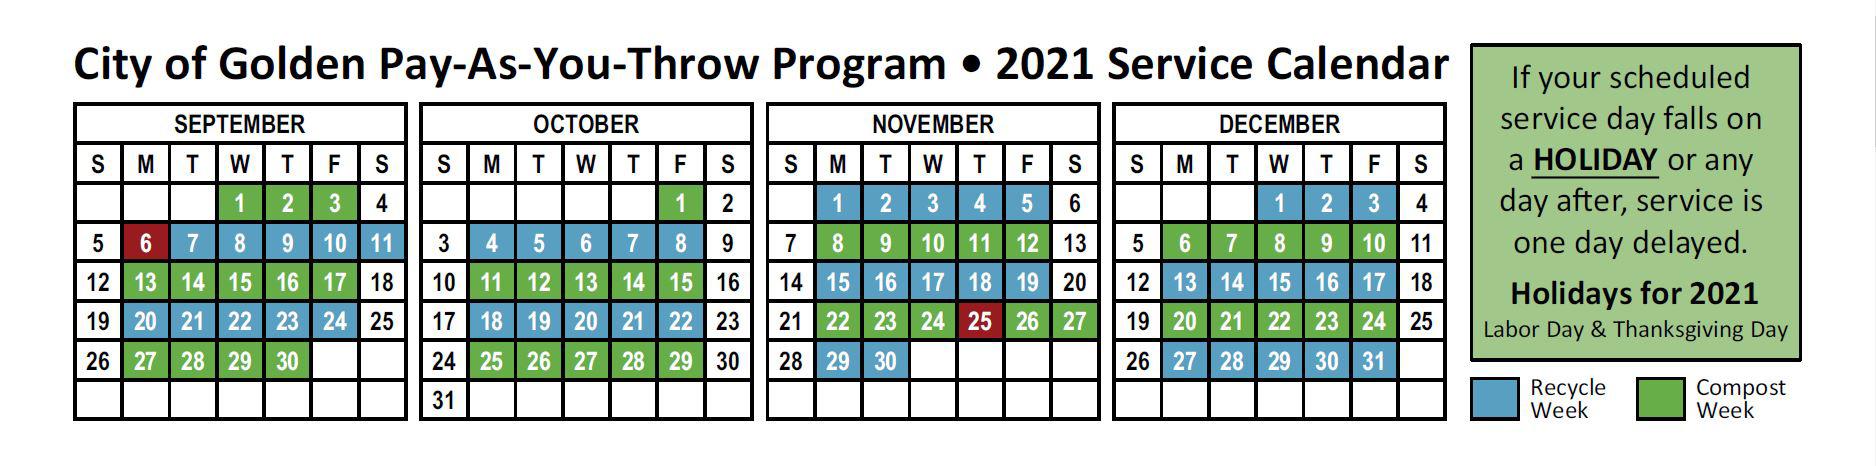 Revised 2021 PAYT Calendar